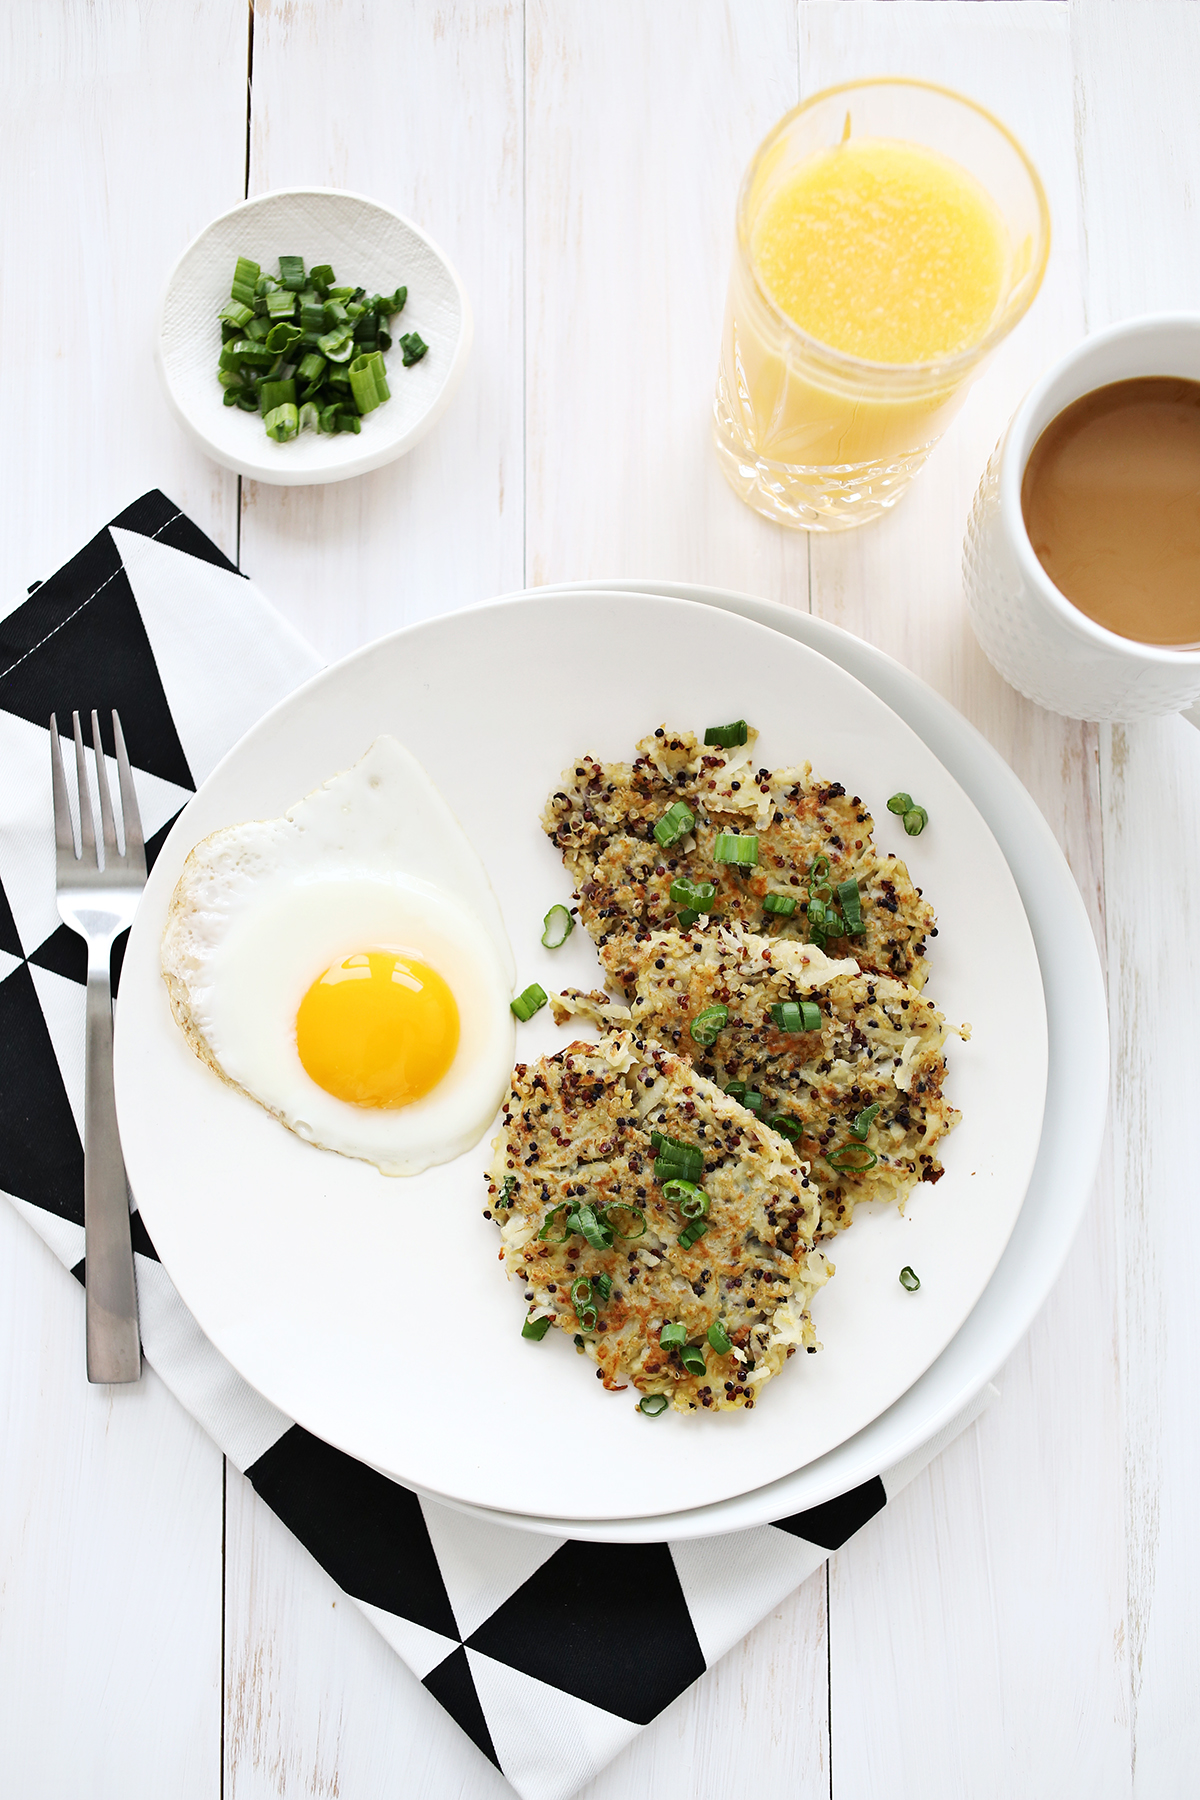 Quinoa breakfast hashbrowns